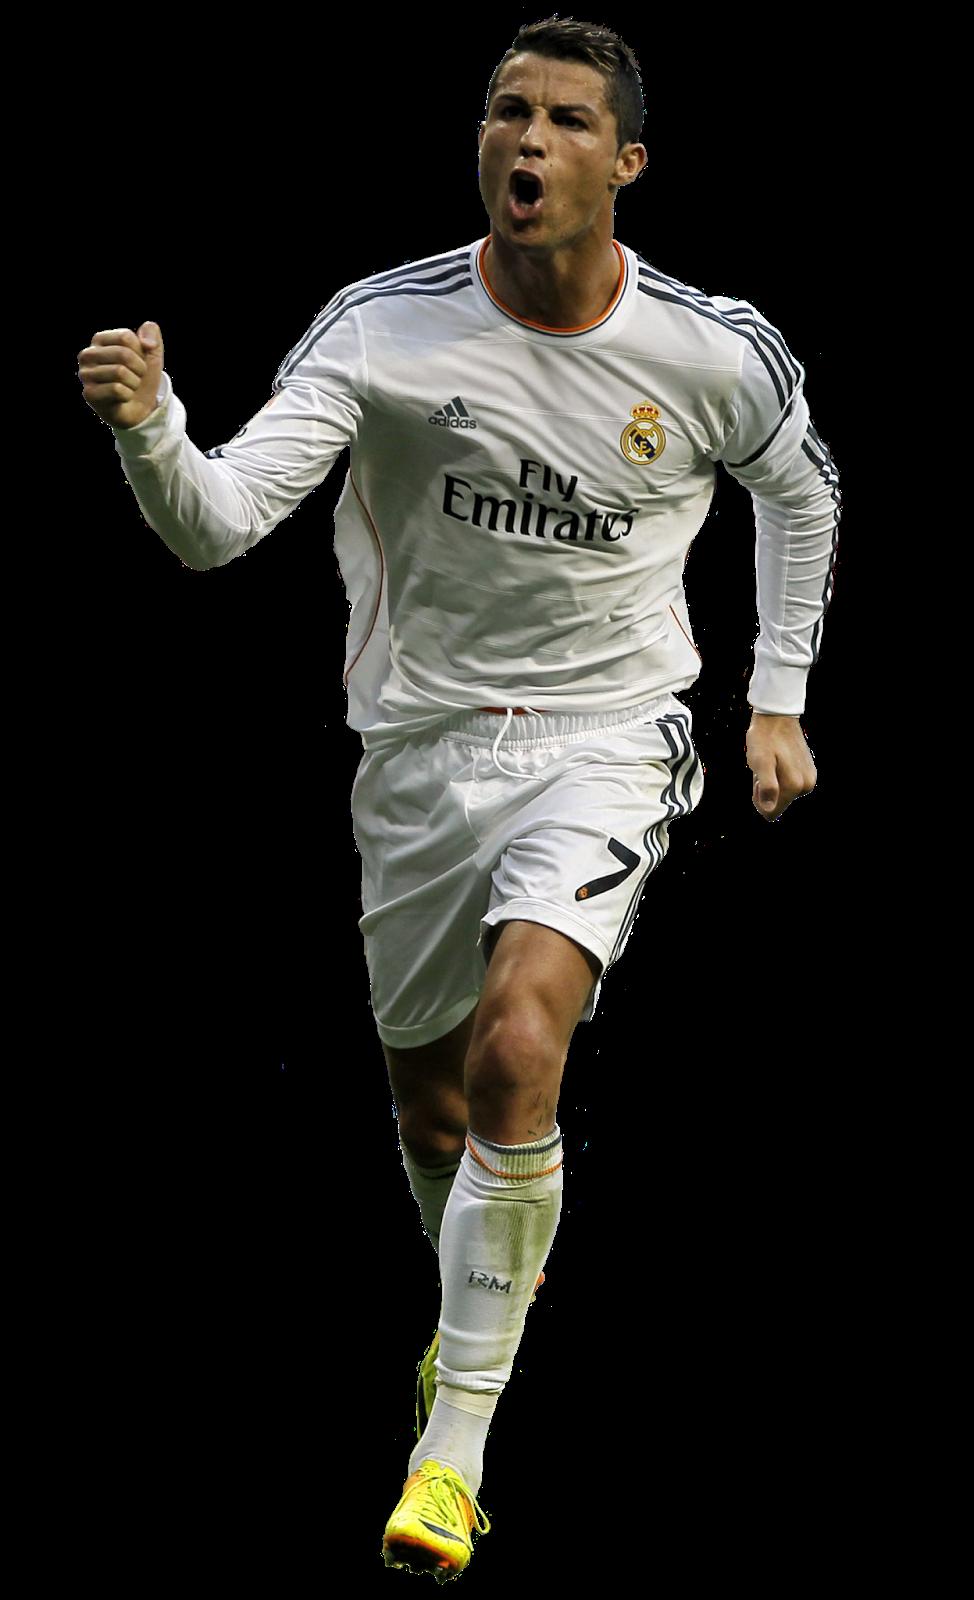 Download Cristiano Ronaldo Hq Png Image Freepngimg